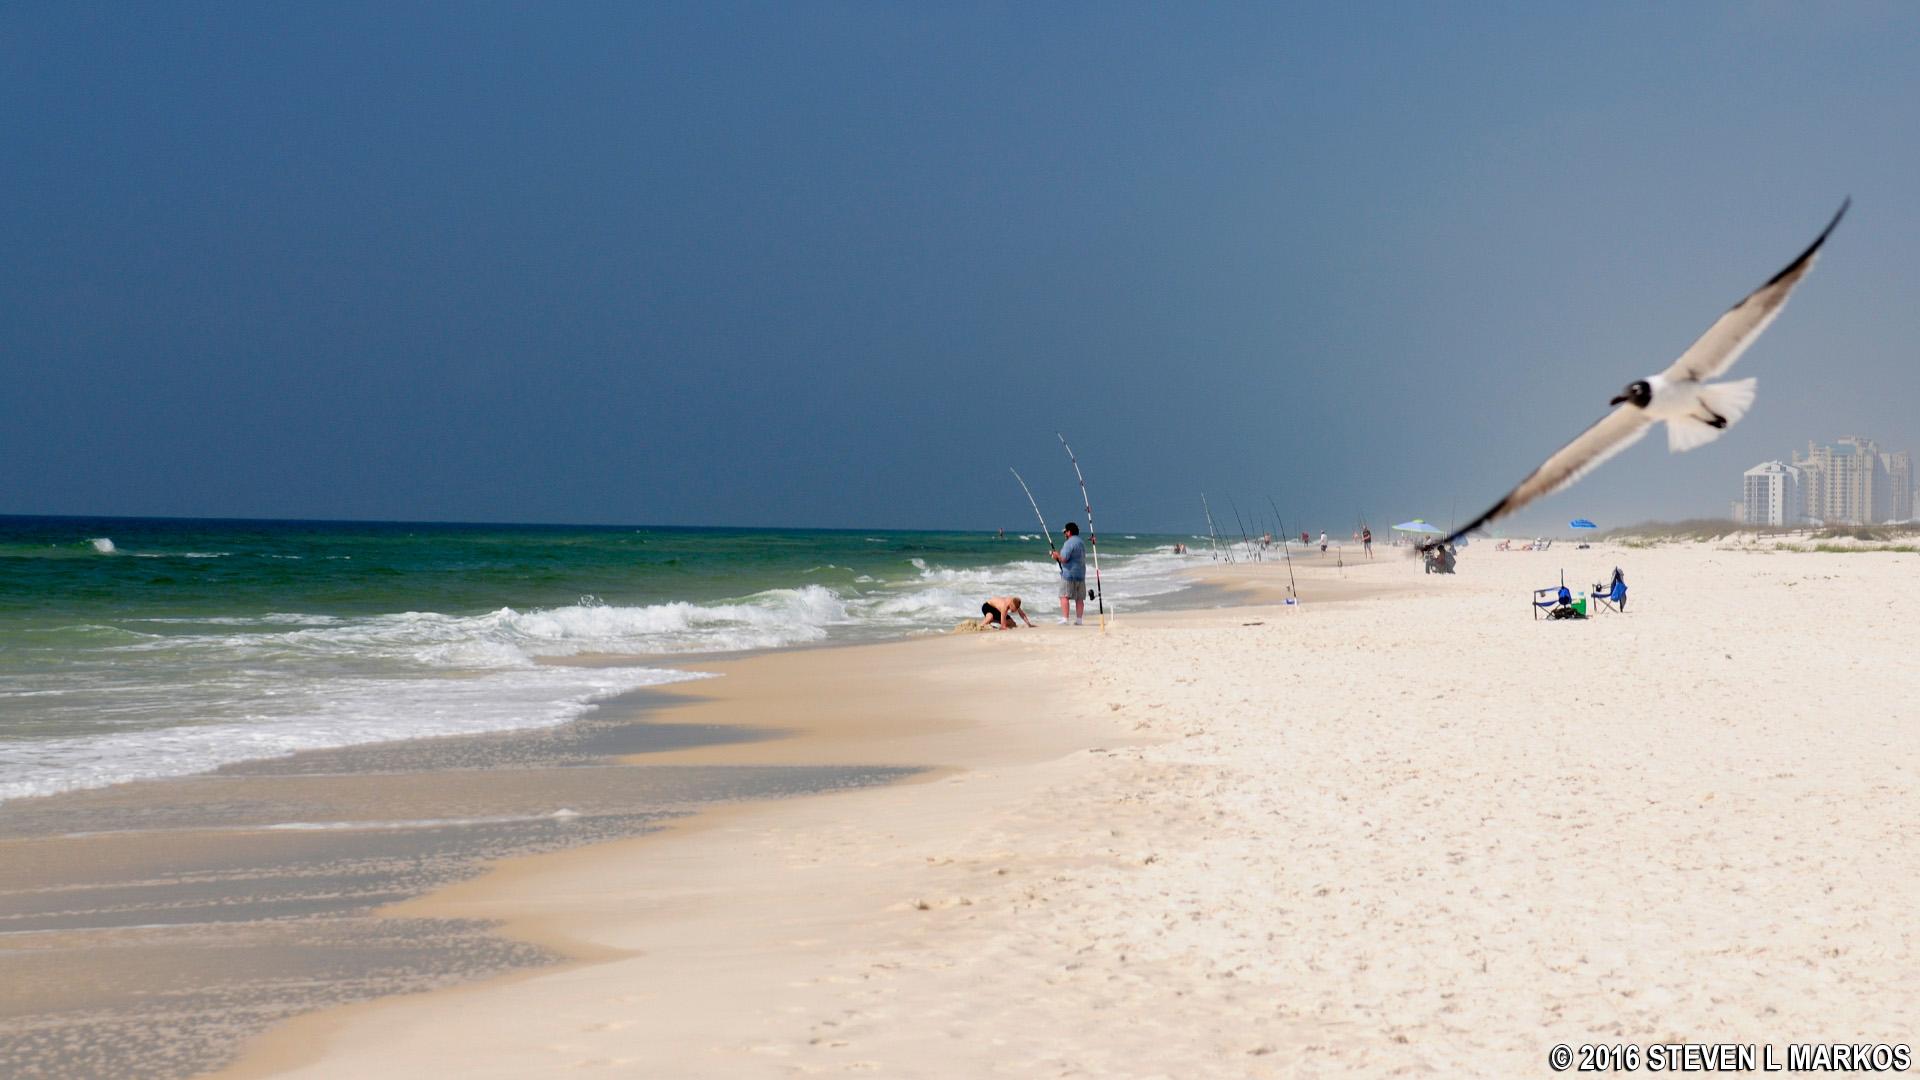 Gulf Islands National Seas Florida